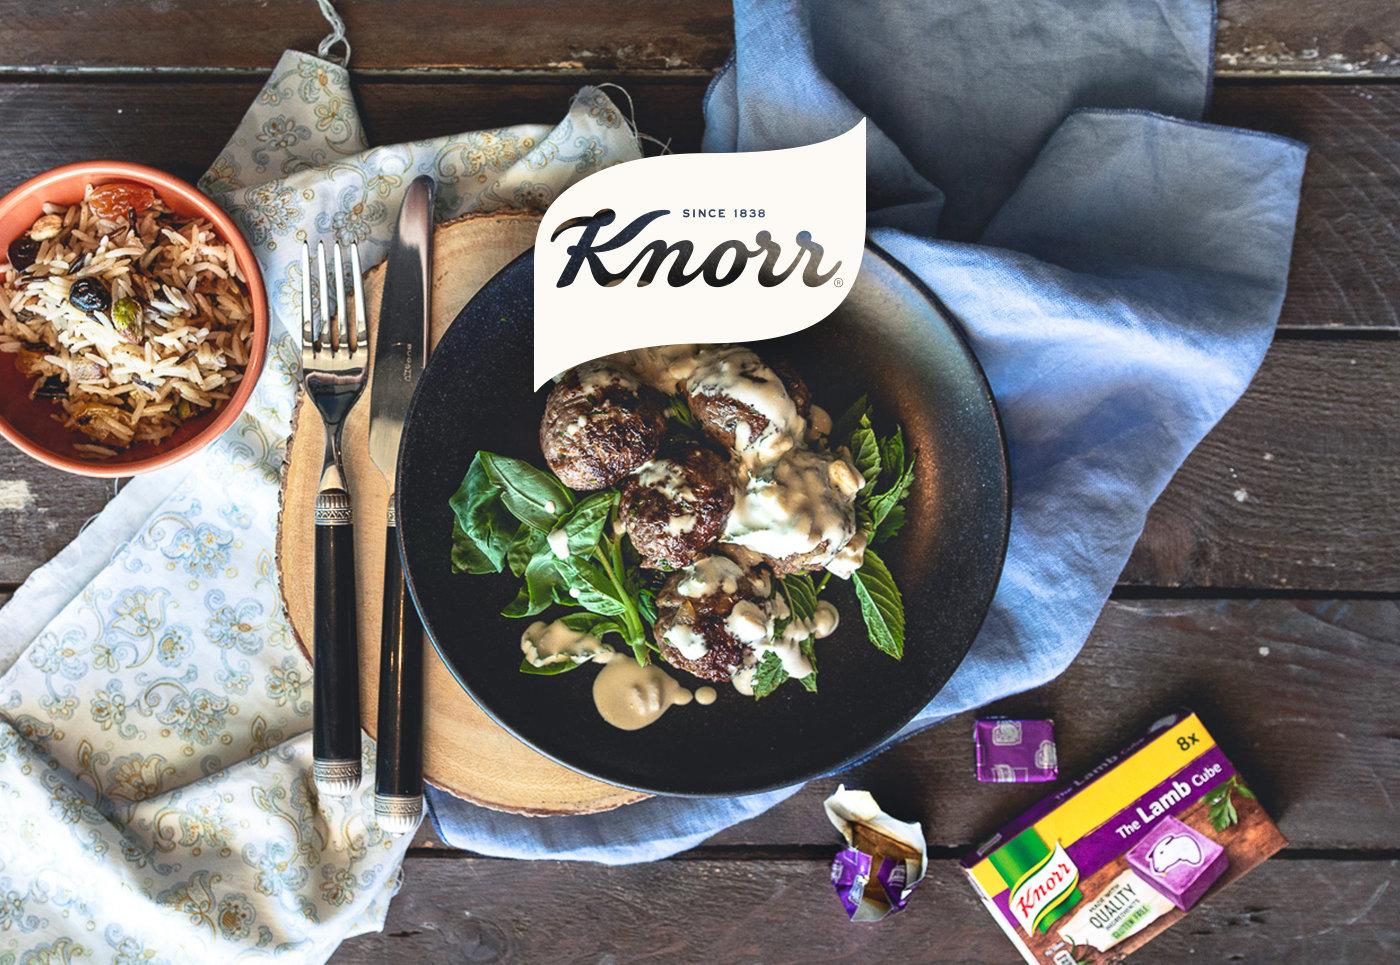 Knorr - Brand Ambassadorship image